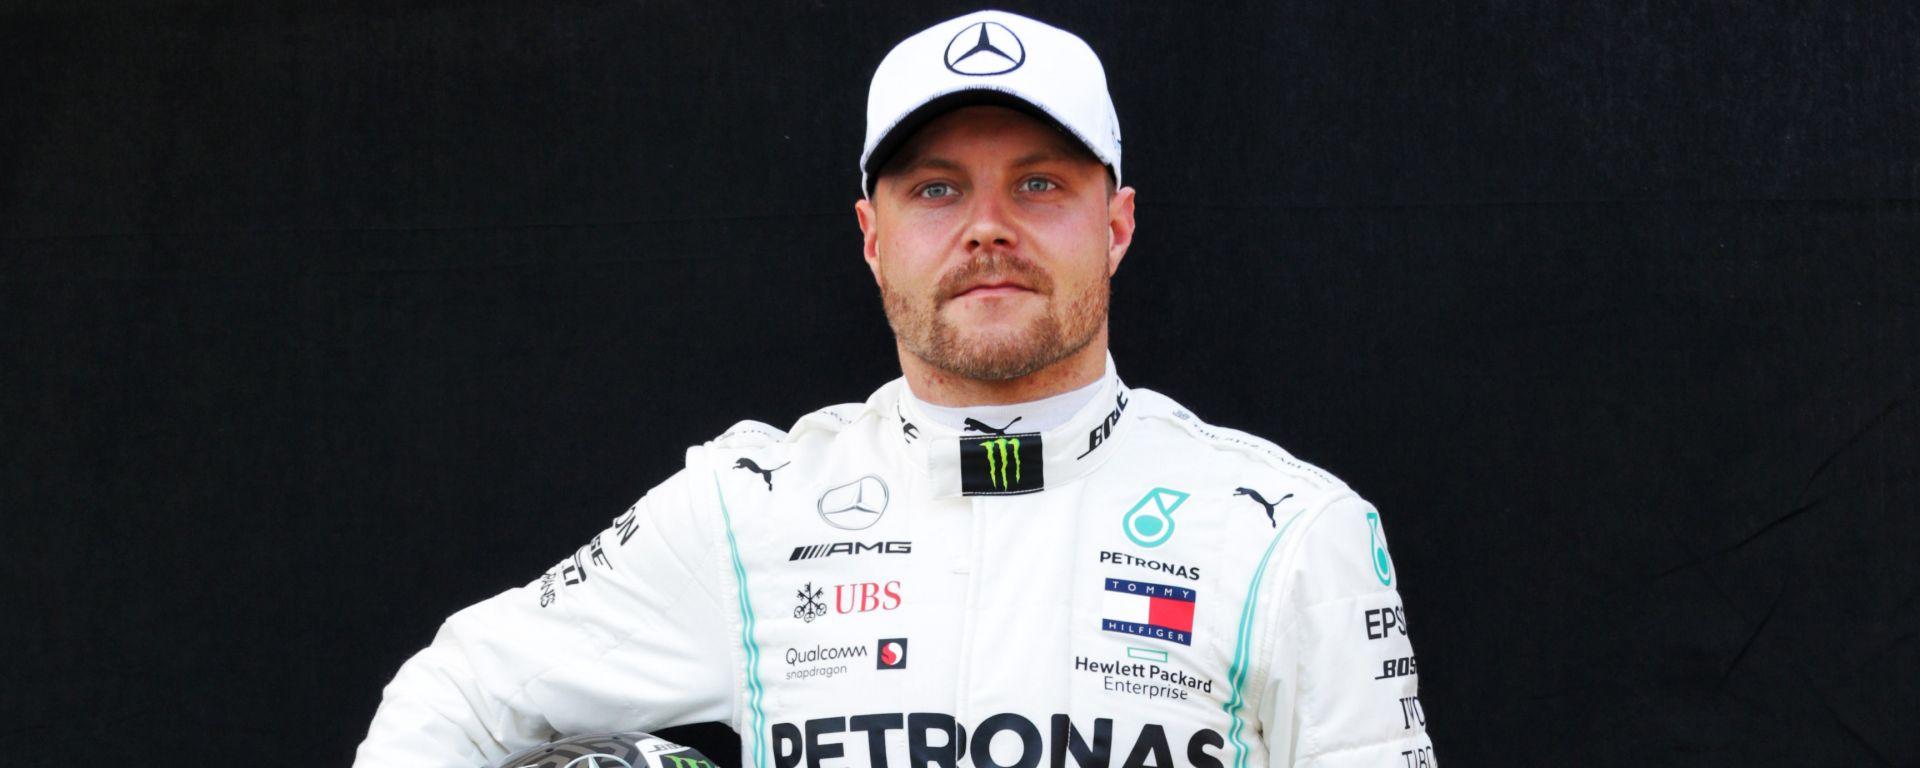 Valtteri Bottas #77 F1 2019